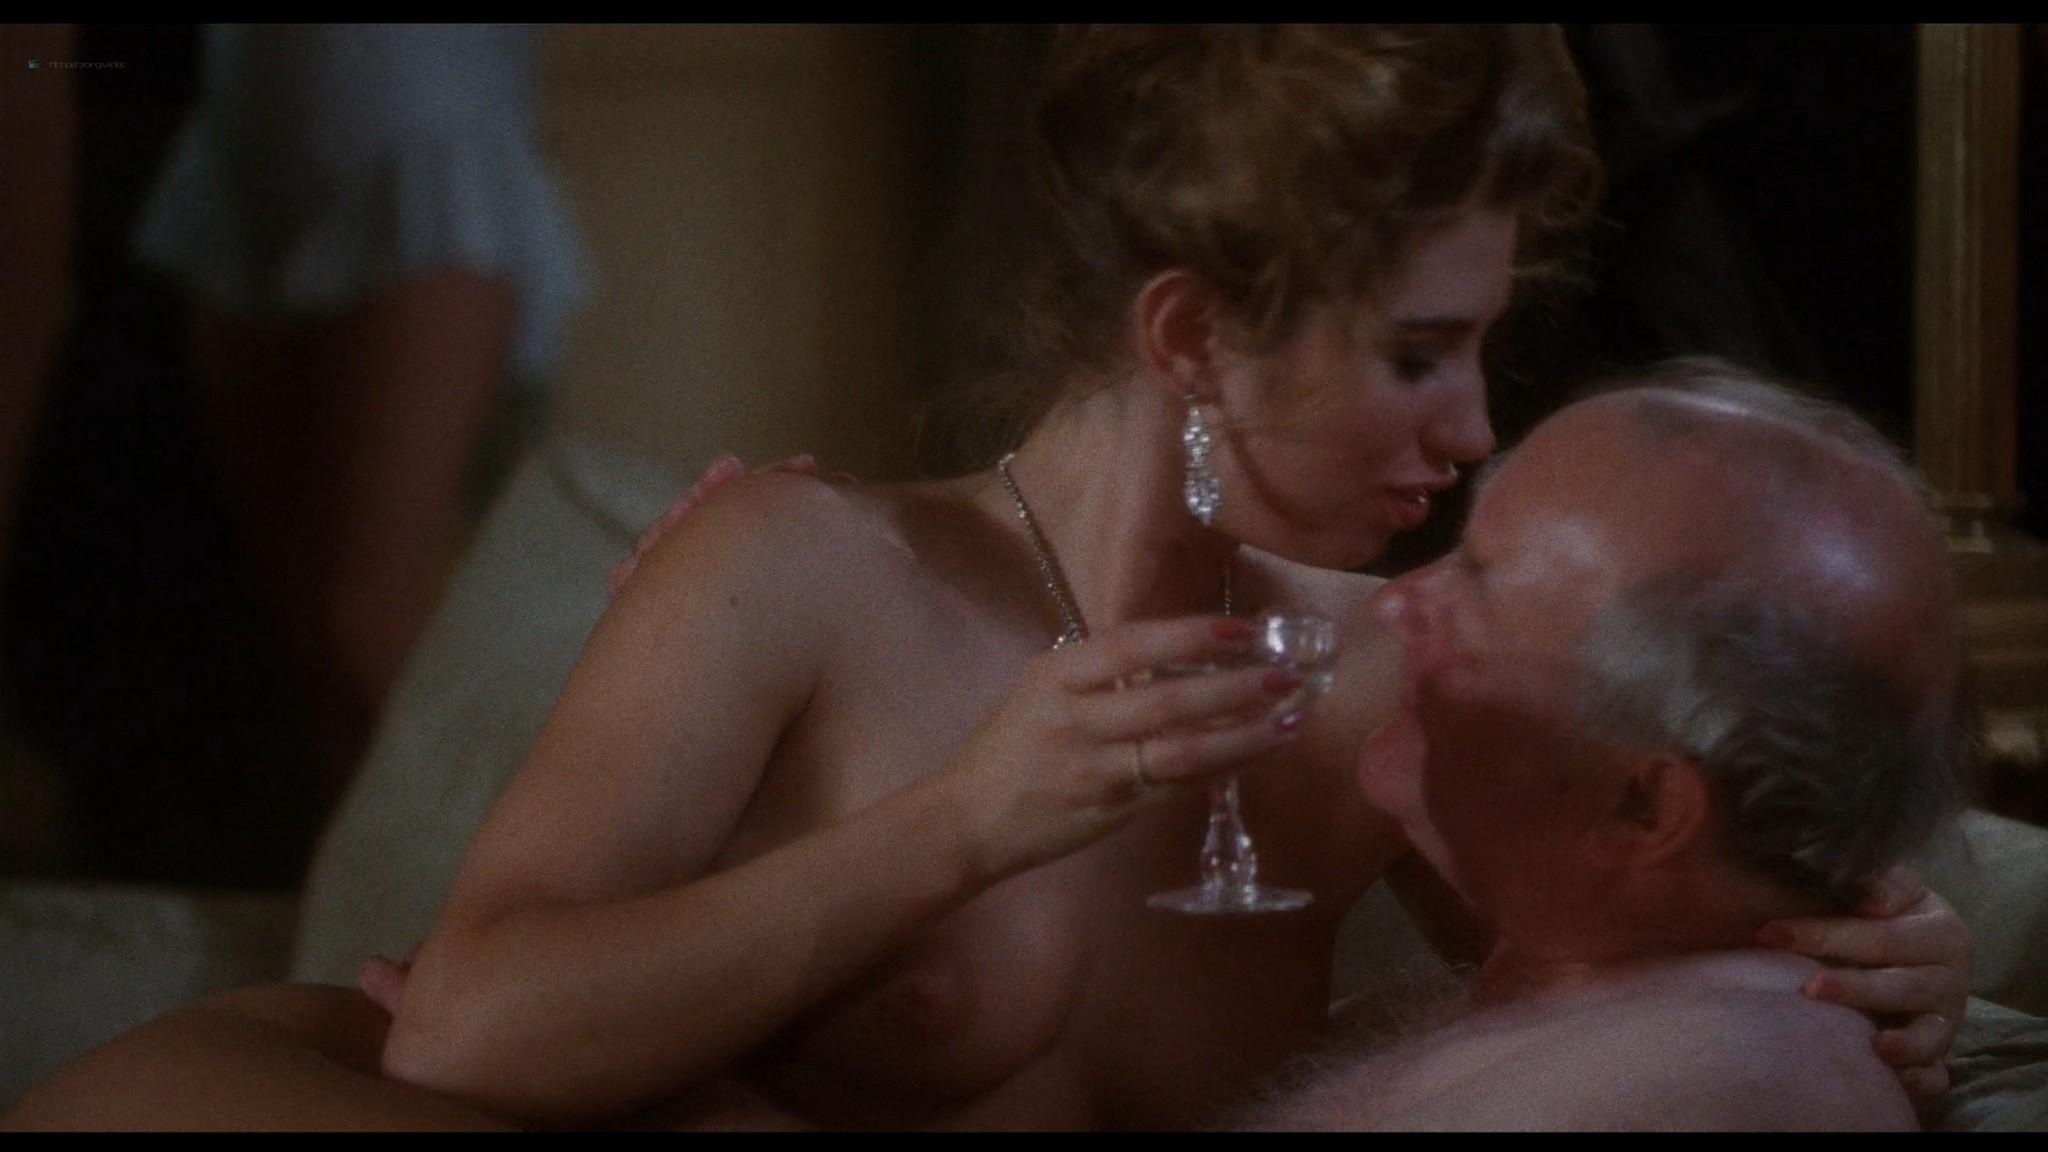 Bridget Fonda nude butt boobs Britt Ekland nude Joanne Whalley hot - Scandal (1989) HD 1080p BluRay (2)